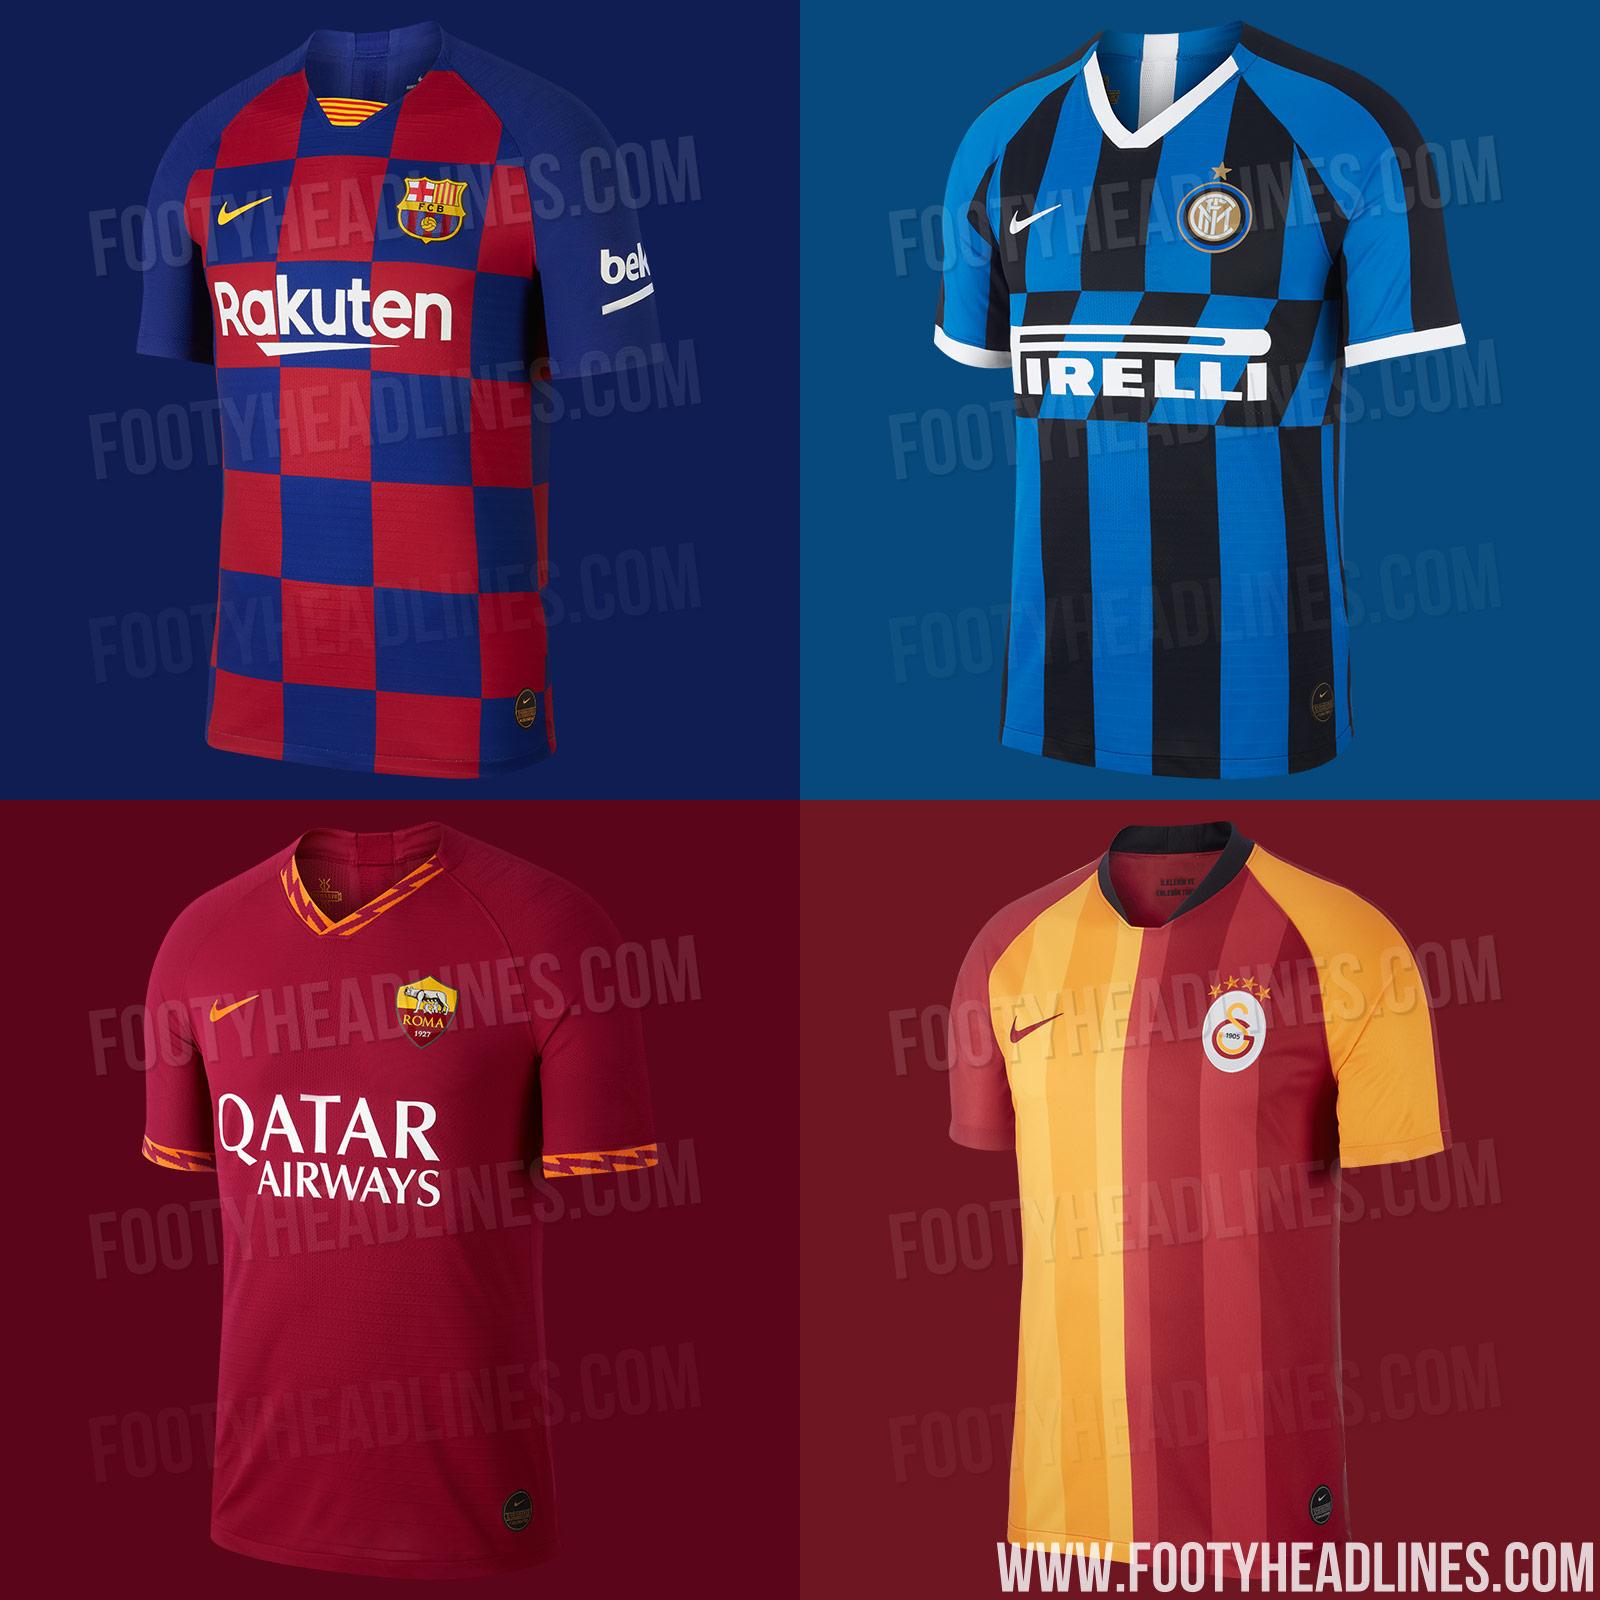 7829ea152 Nike Replica Football Kits To Retail At 90 Euro From 2019-20 Season